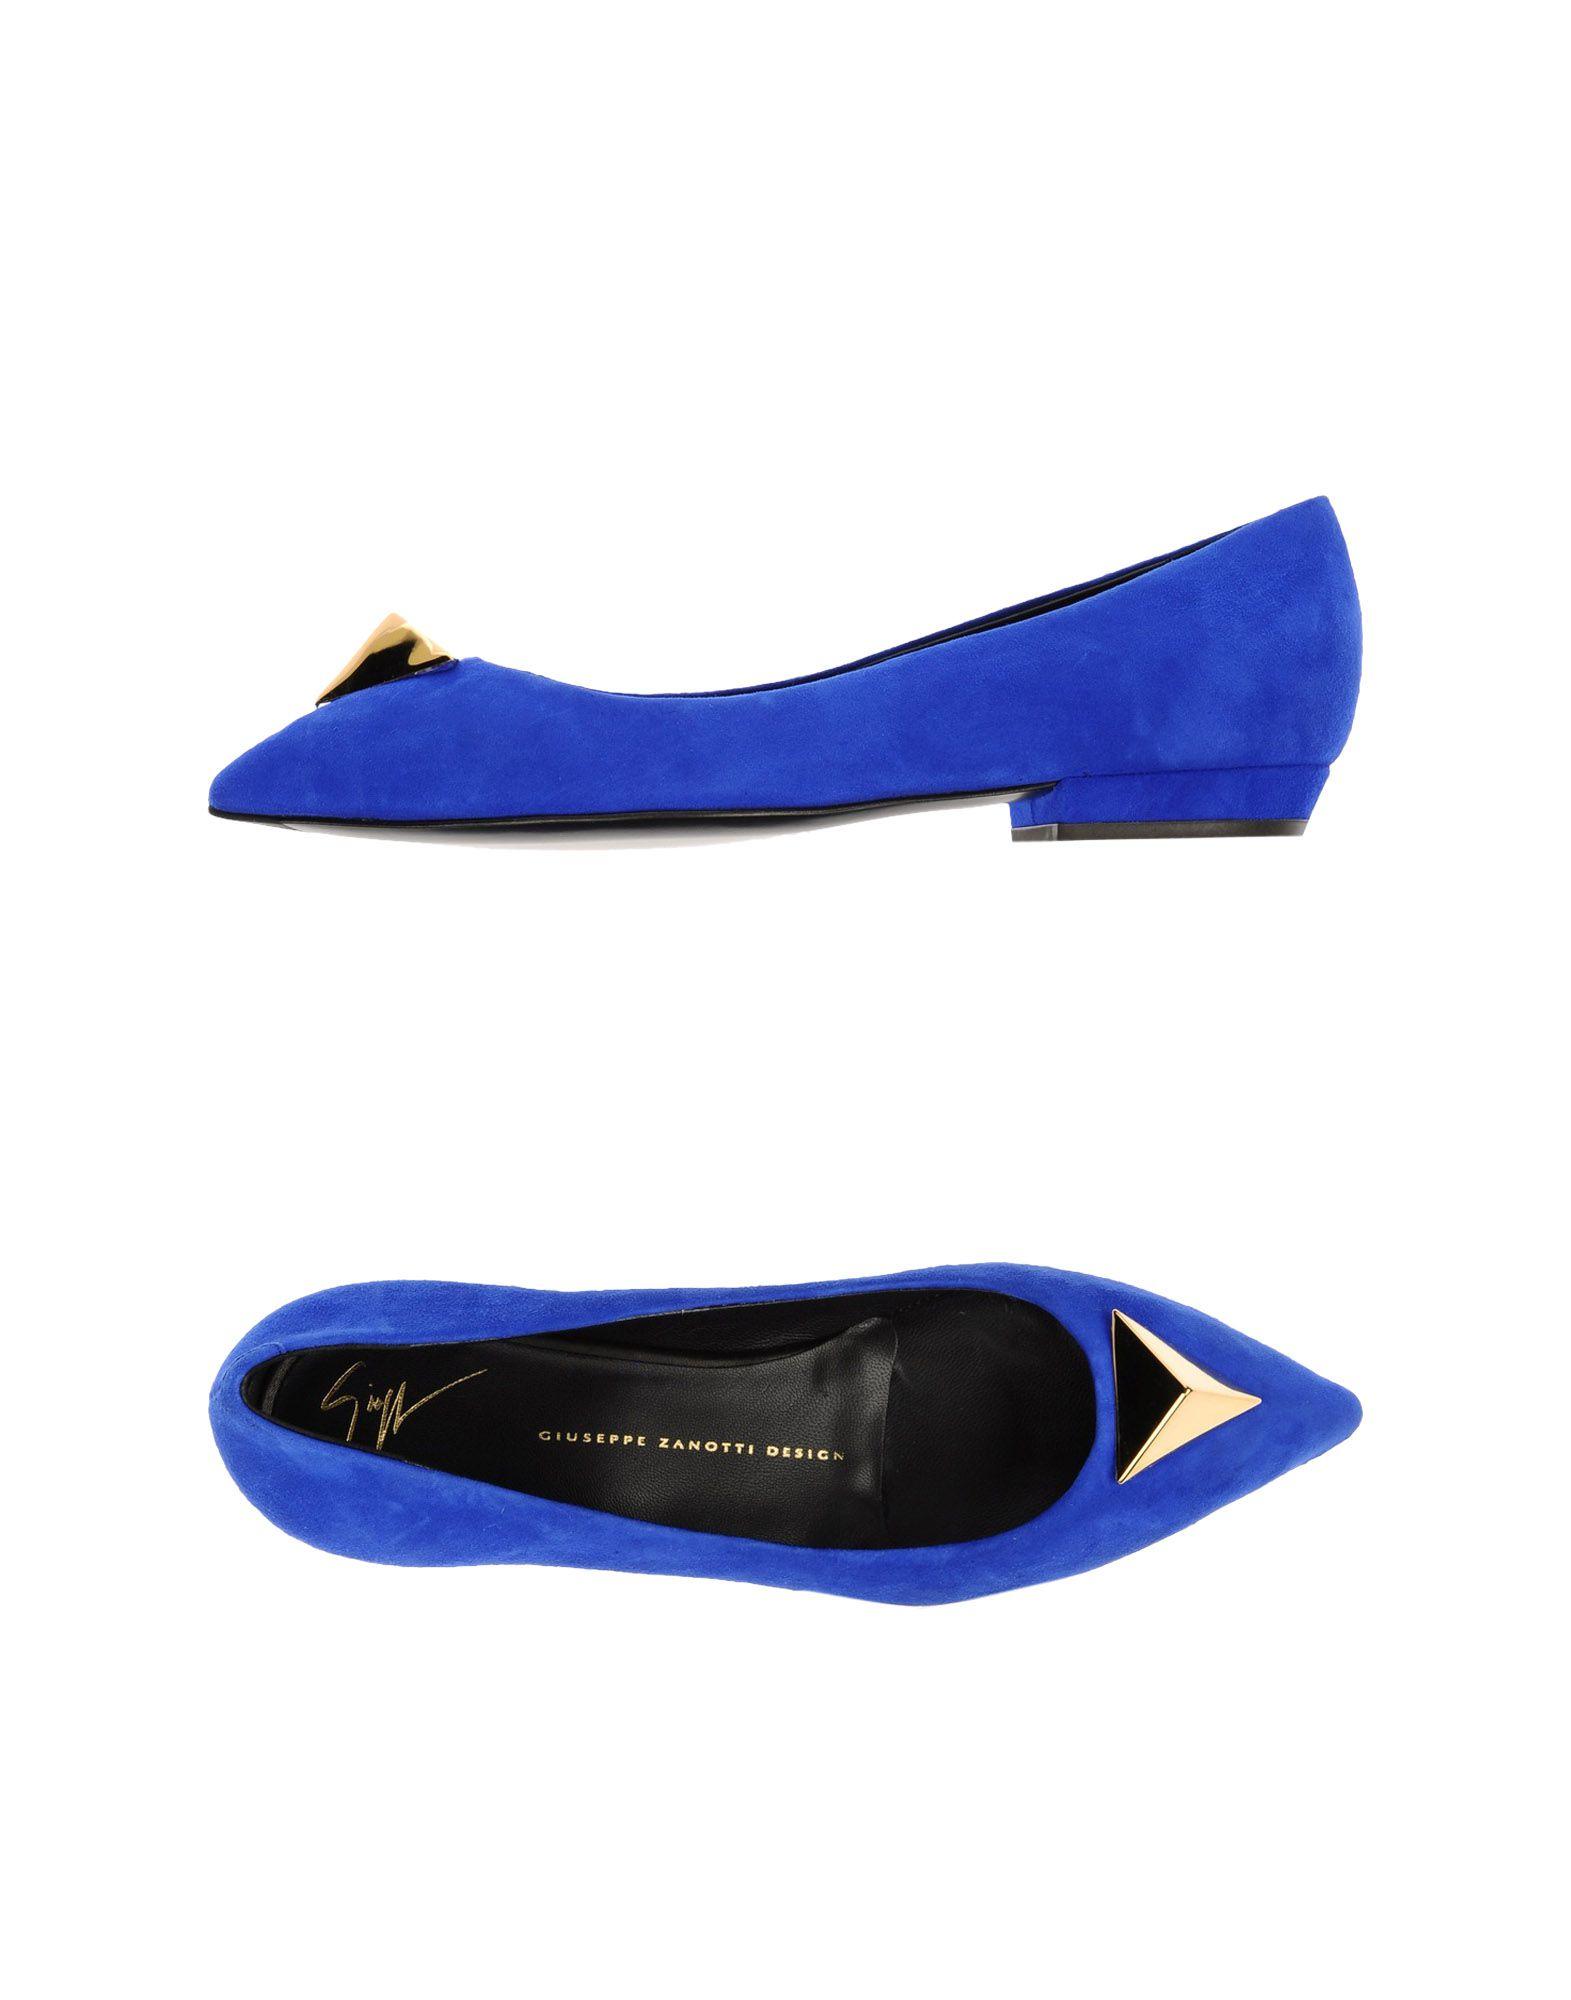 Giuseppe Zanotti Ballet Flats In Blue (Bright Blue) | Lyst